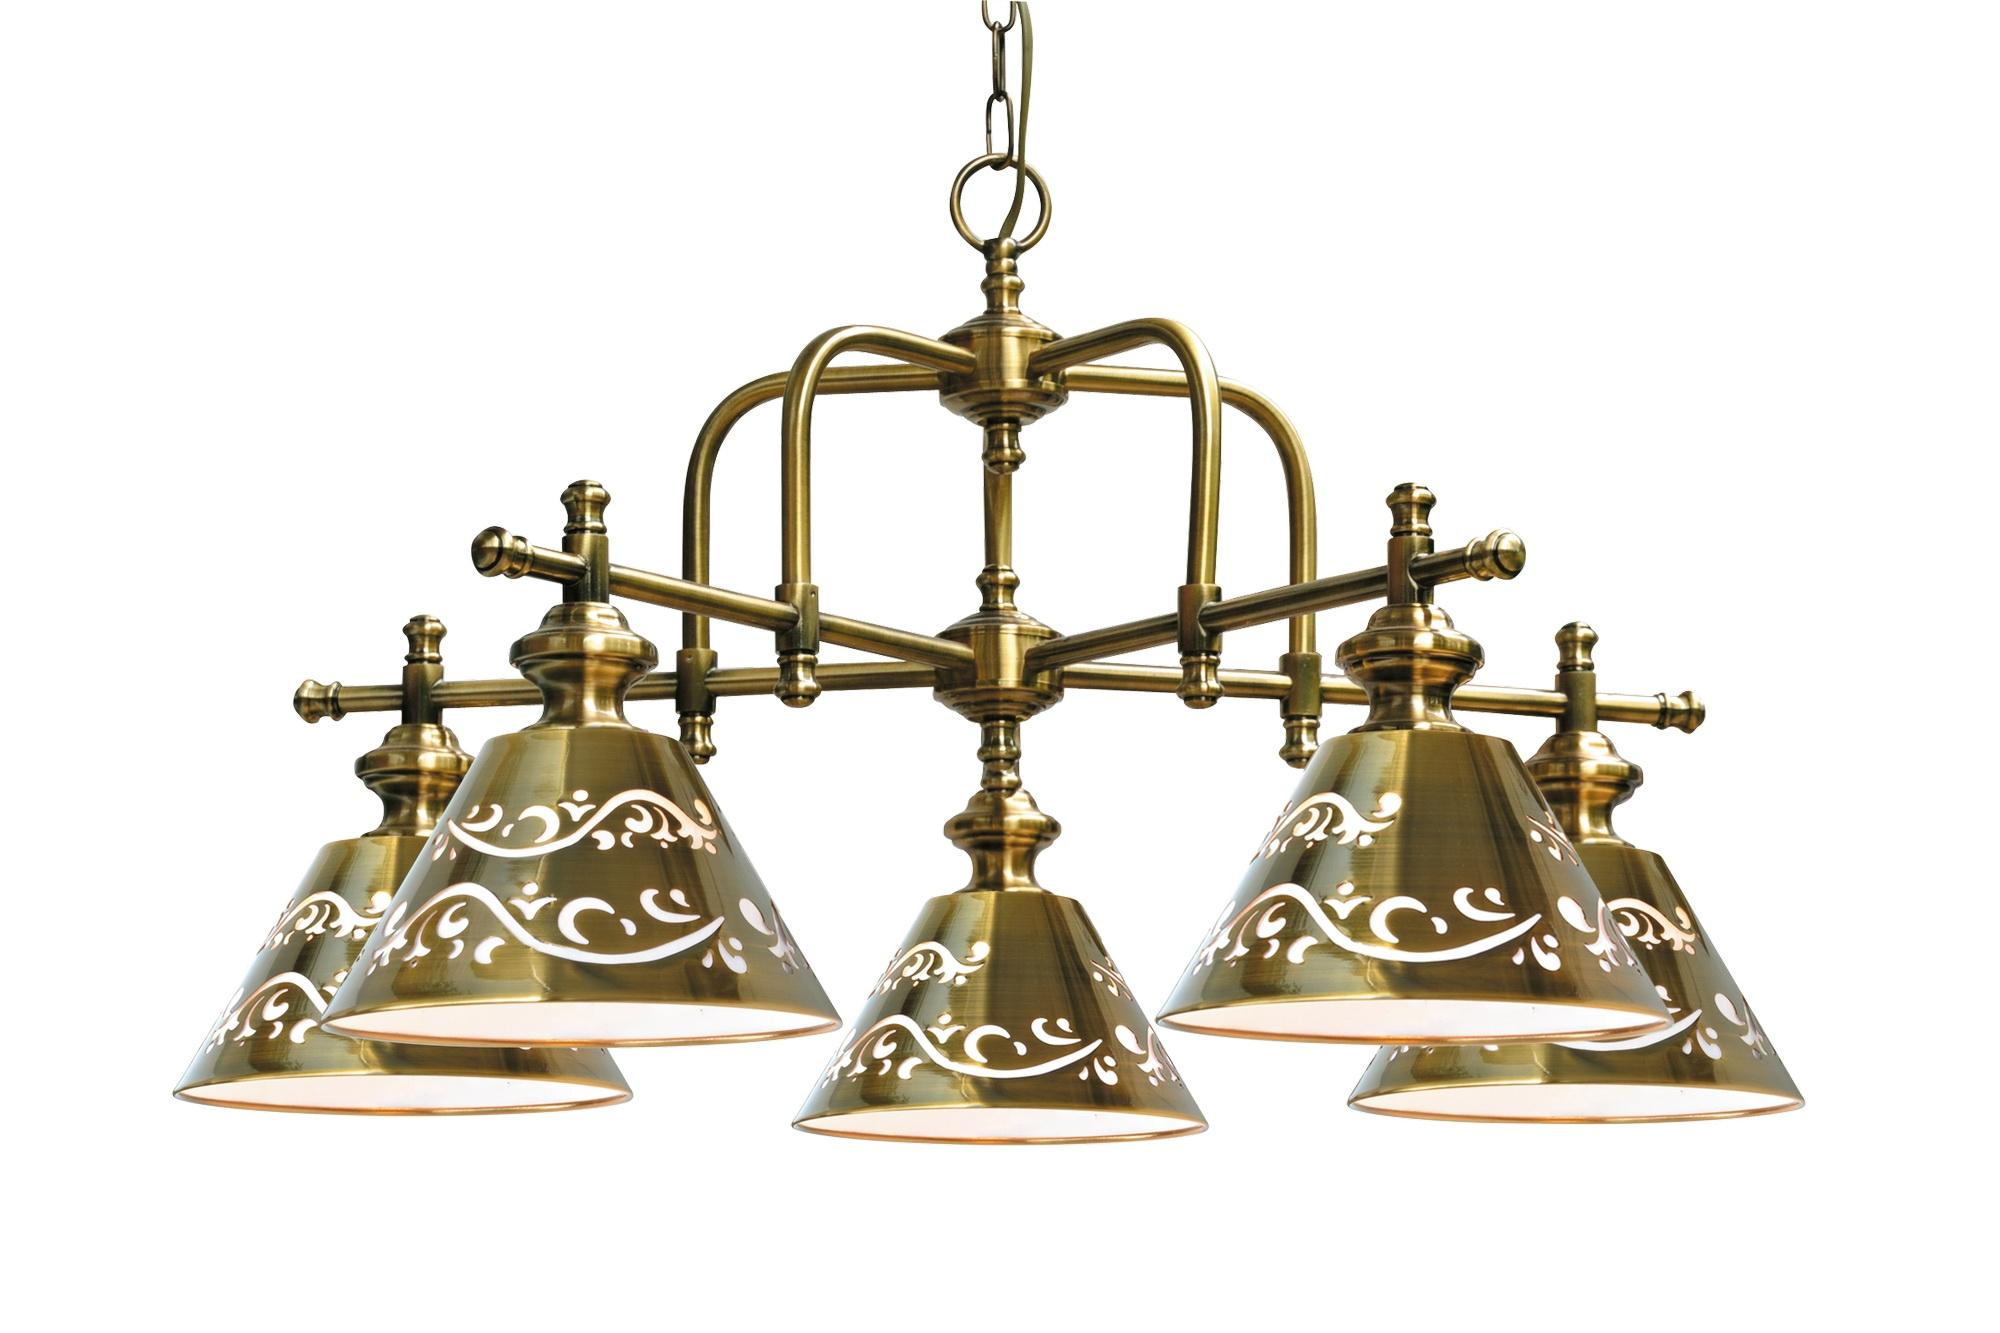 Люстра Arte lamp Kensington a1511lm-5pb arte lamp kensington a1511lm 3pb